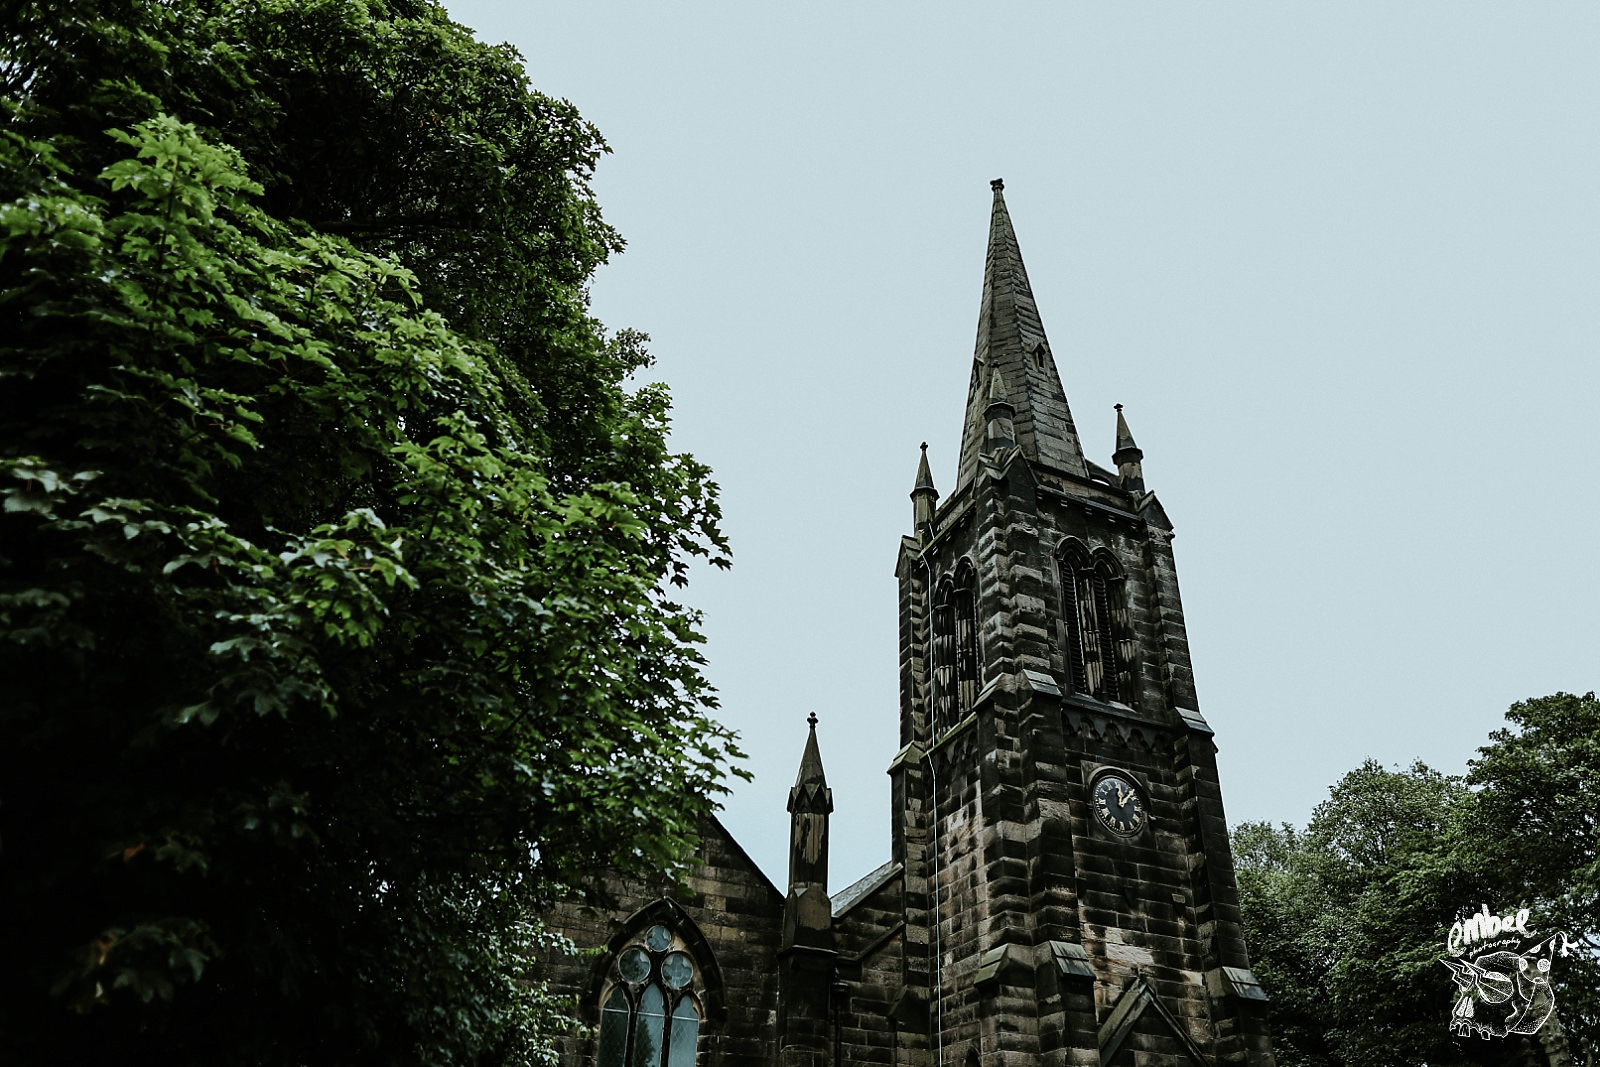 church steeple in burscough